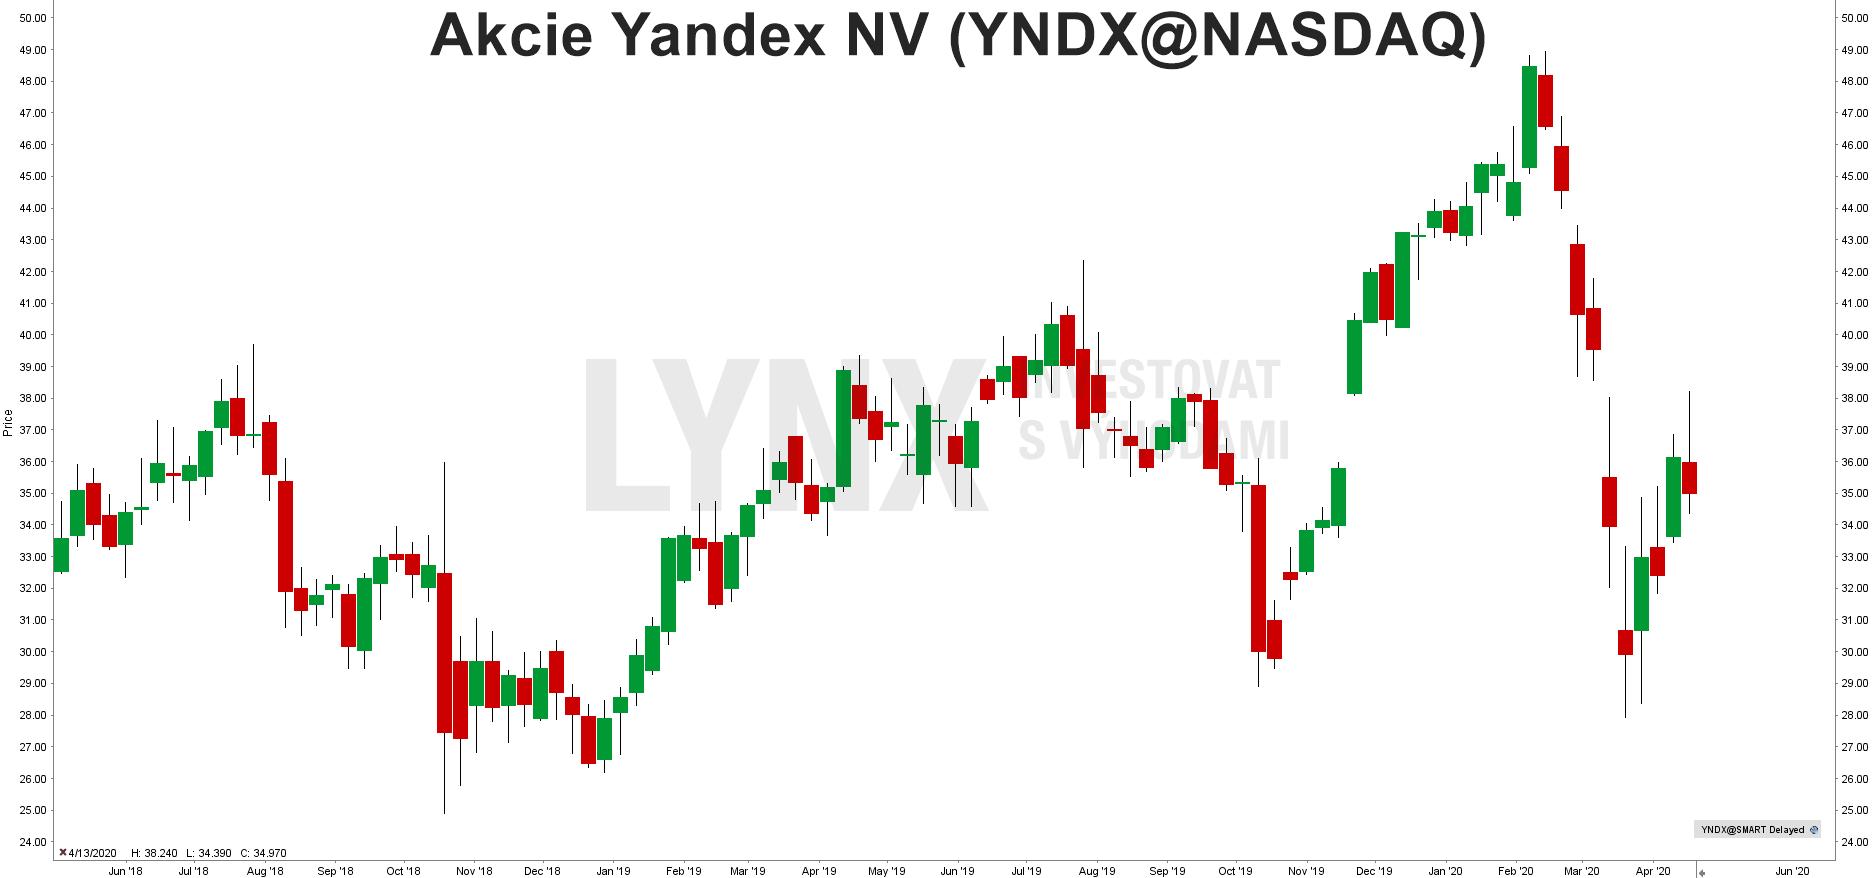 Akcie Yandex